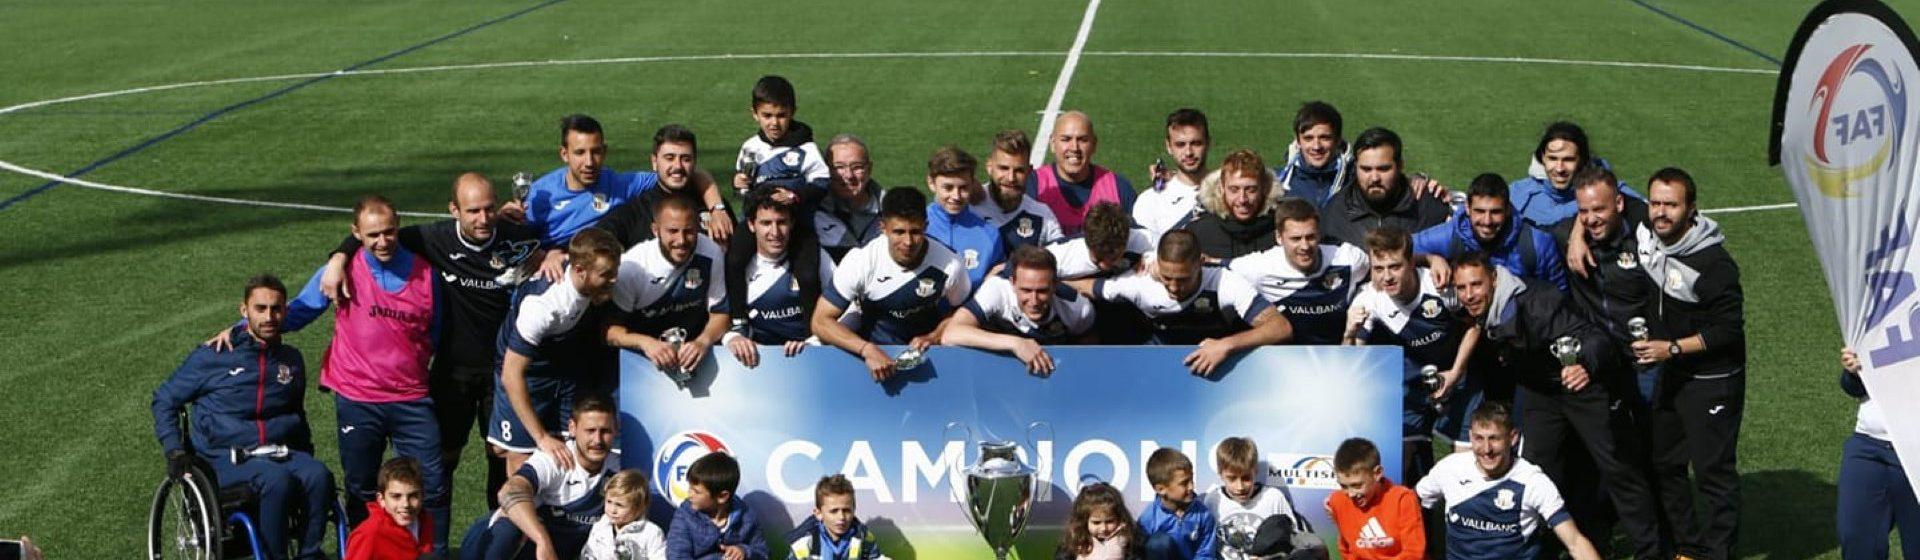 FC Santa Coloma header